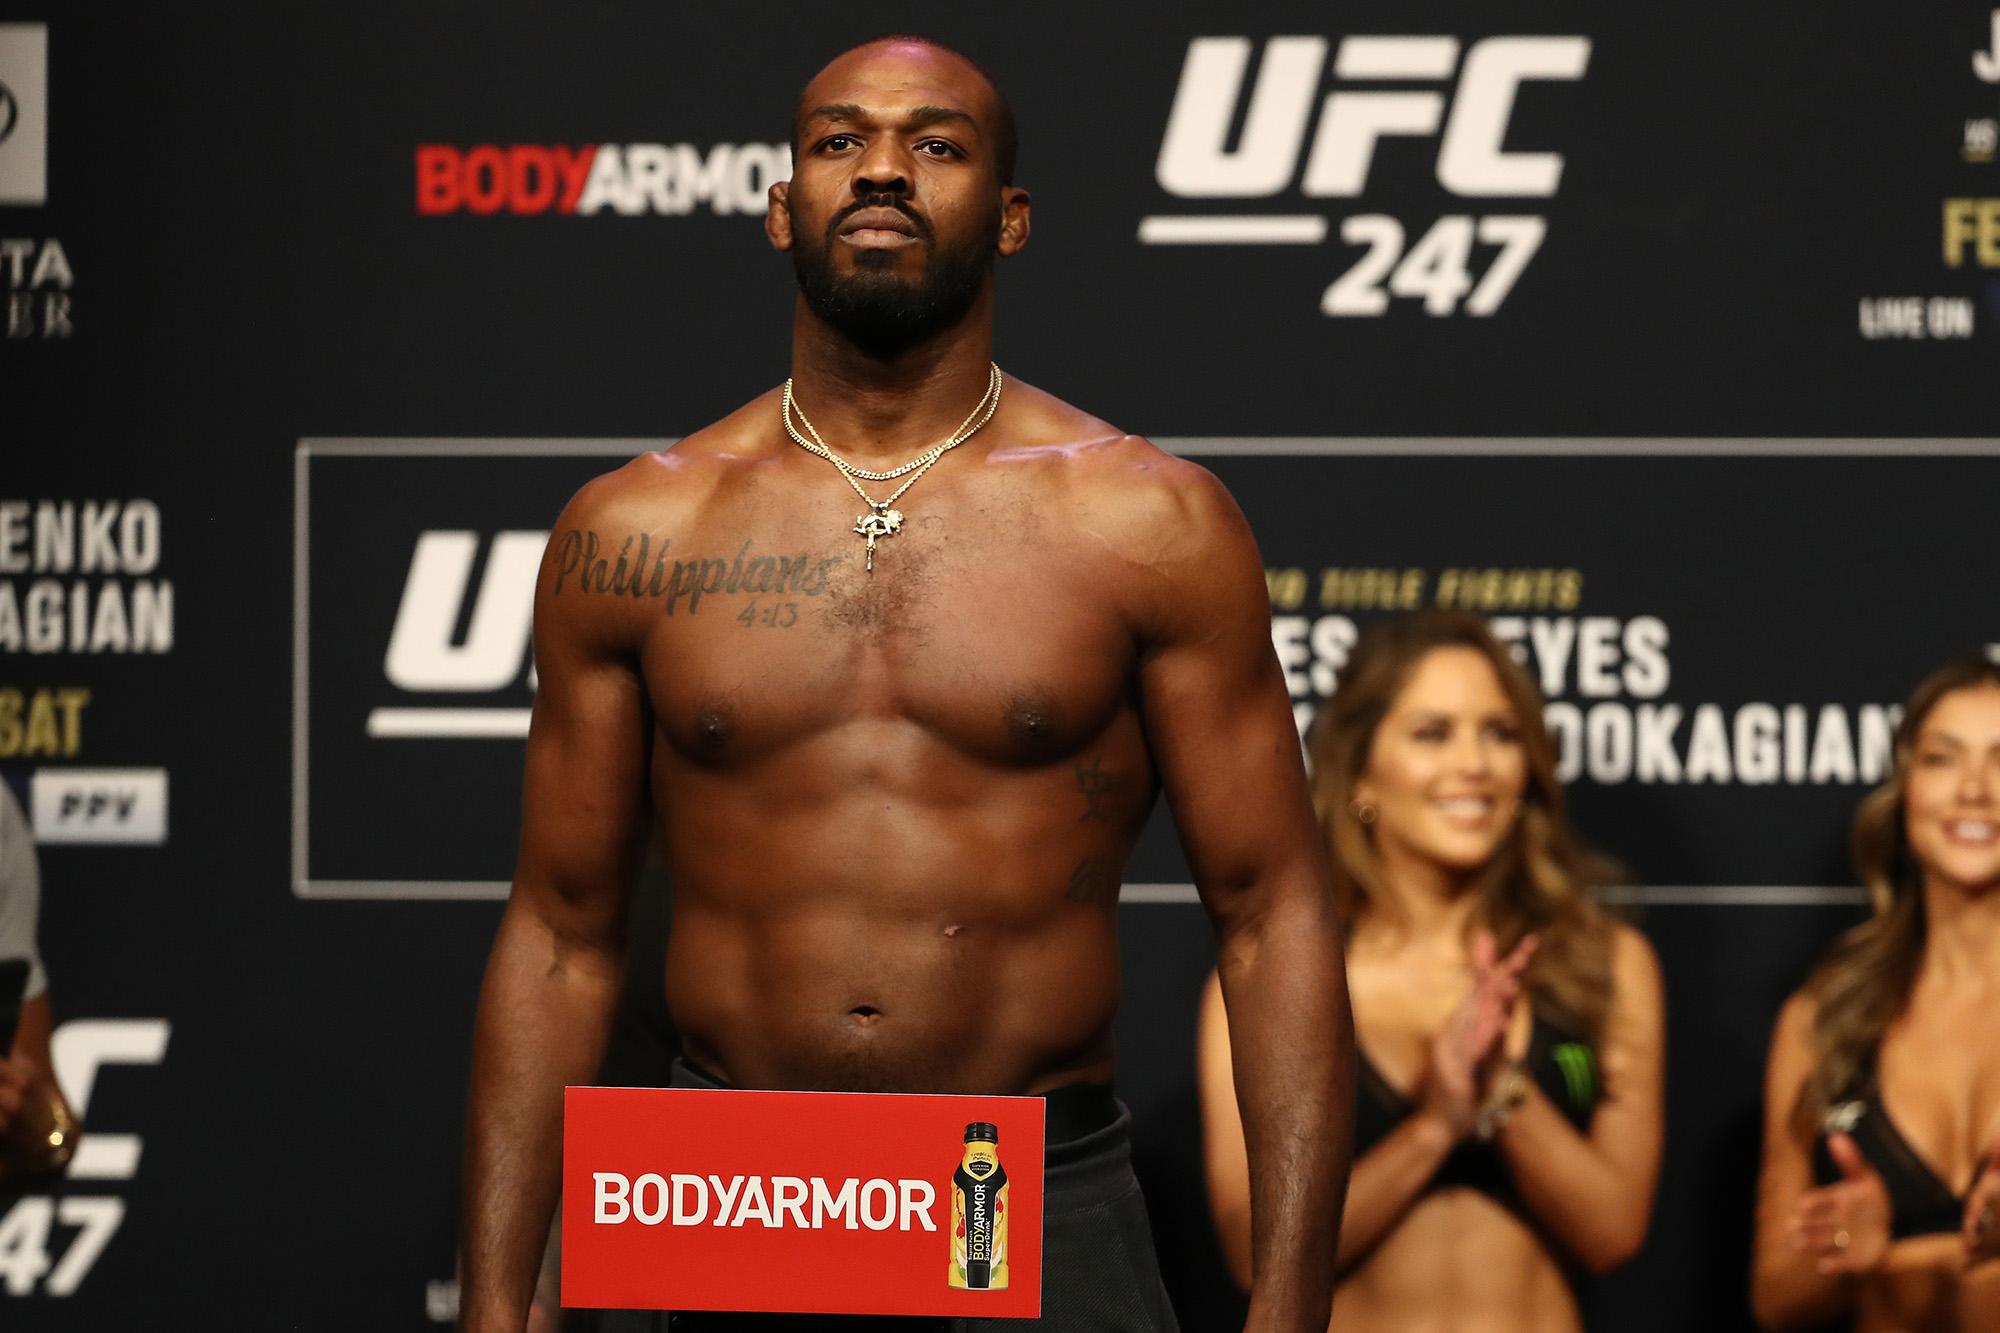 UFC 247 could be Jon Jones' last light heavyweight fight